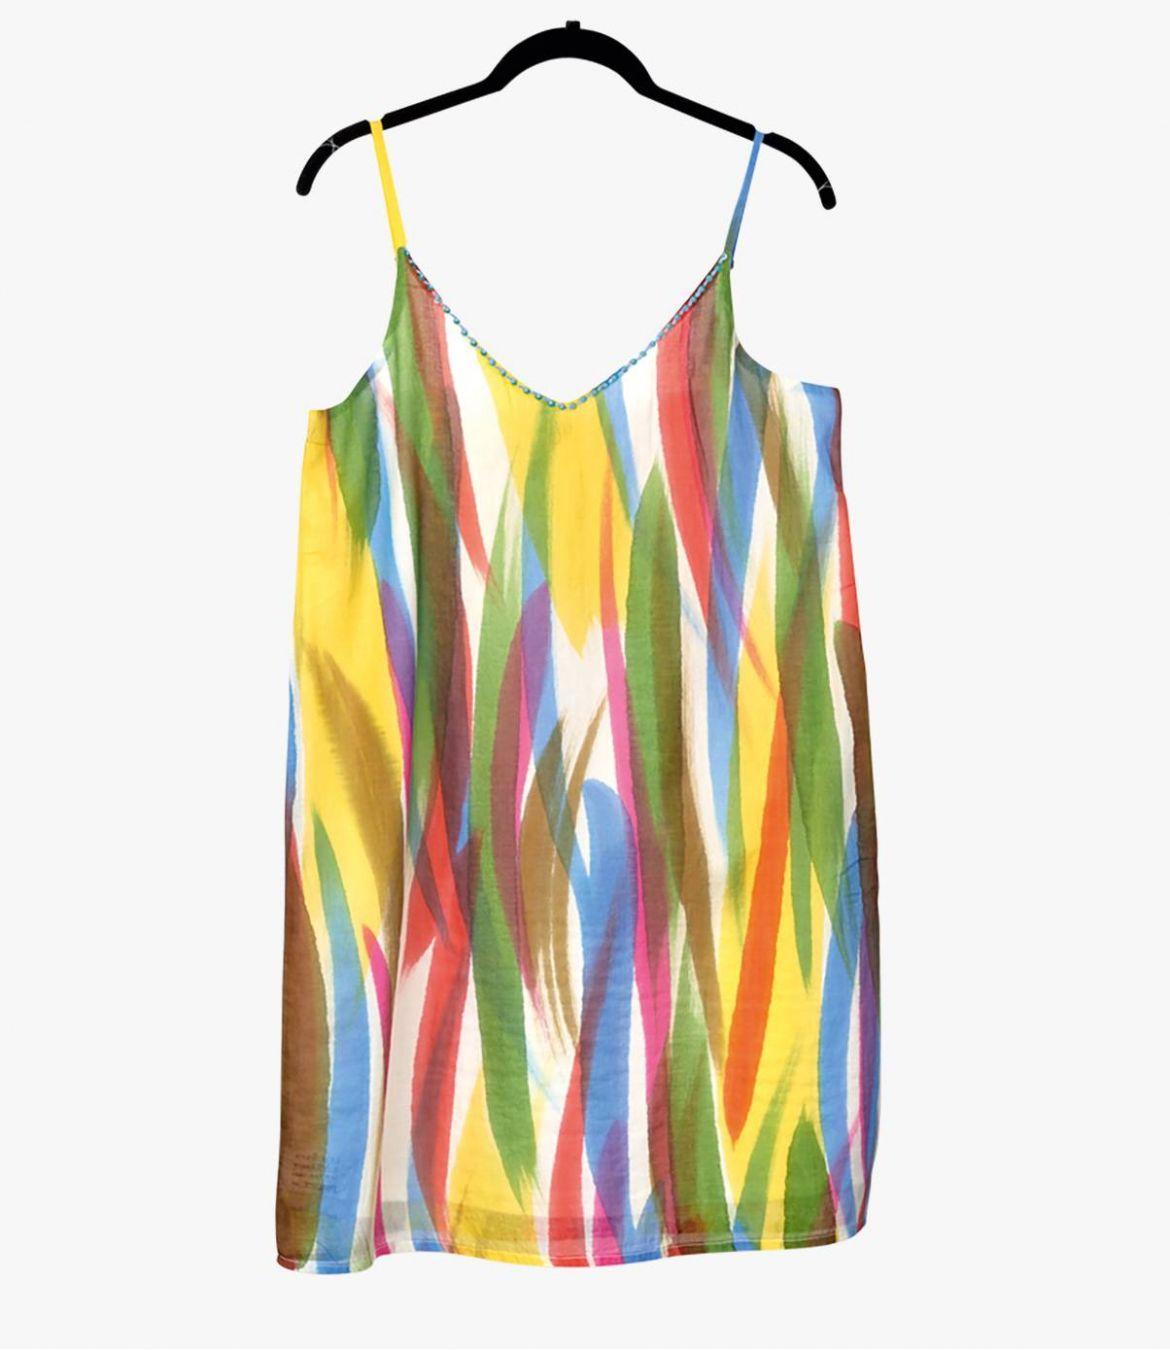 ALOA MULTI Cotton Dress for Women Storiatipic - 1